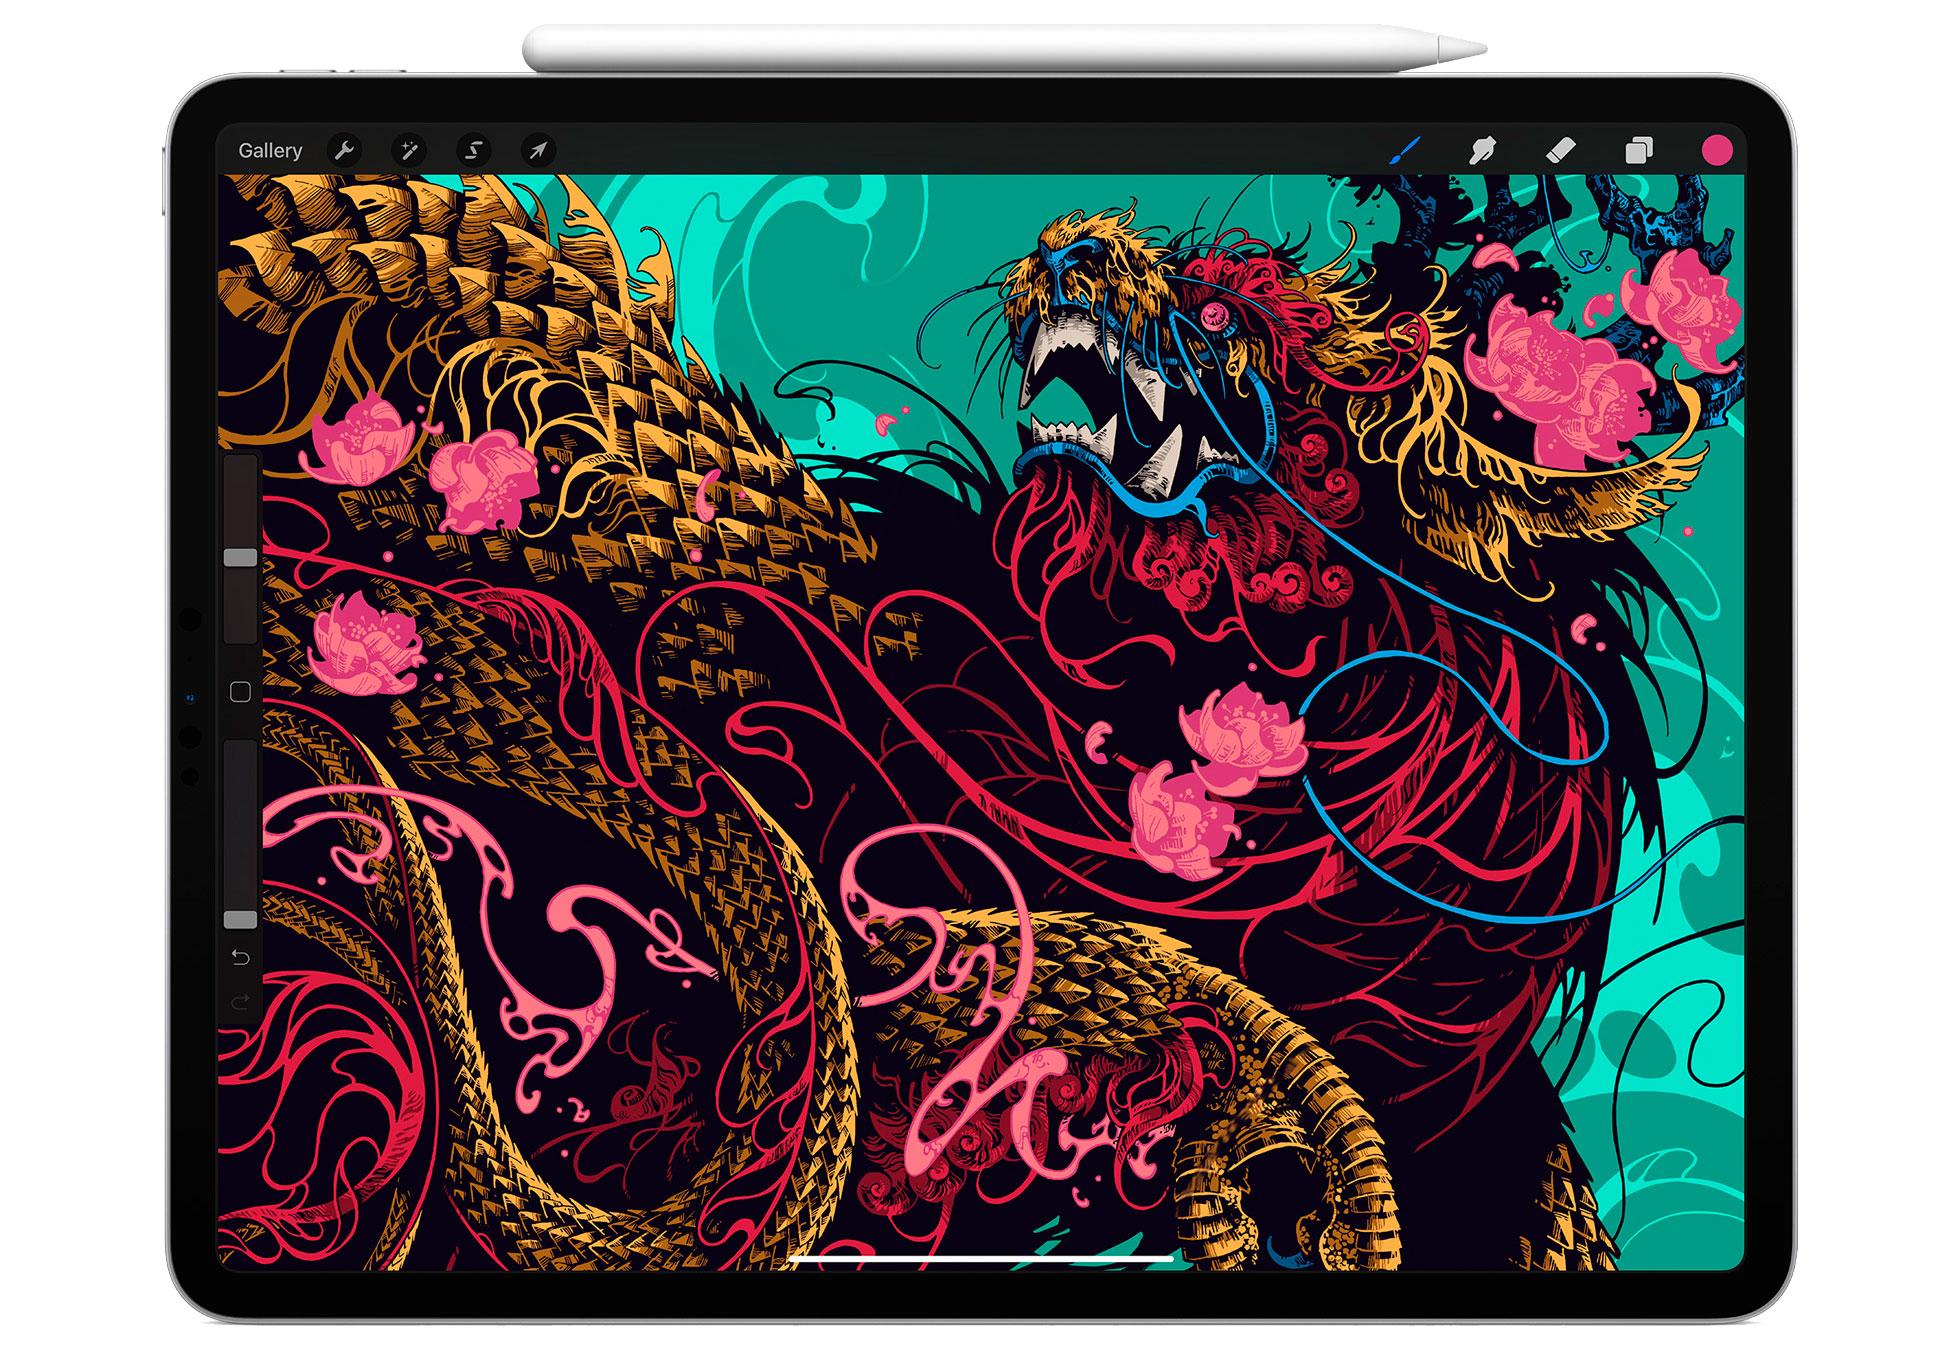 https://www.macfreak.nl/modules/news/images/zArt.iPadPro2020PencilProDisplay.jpg